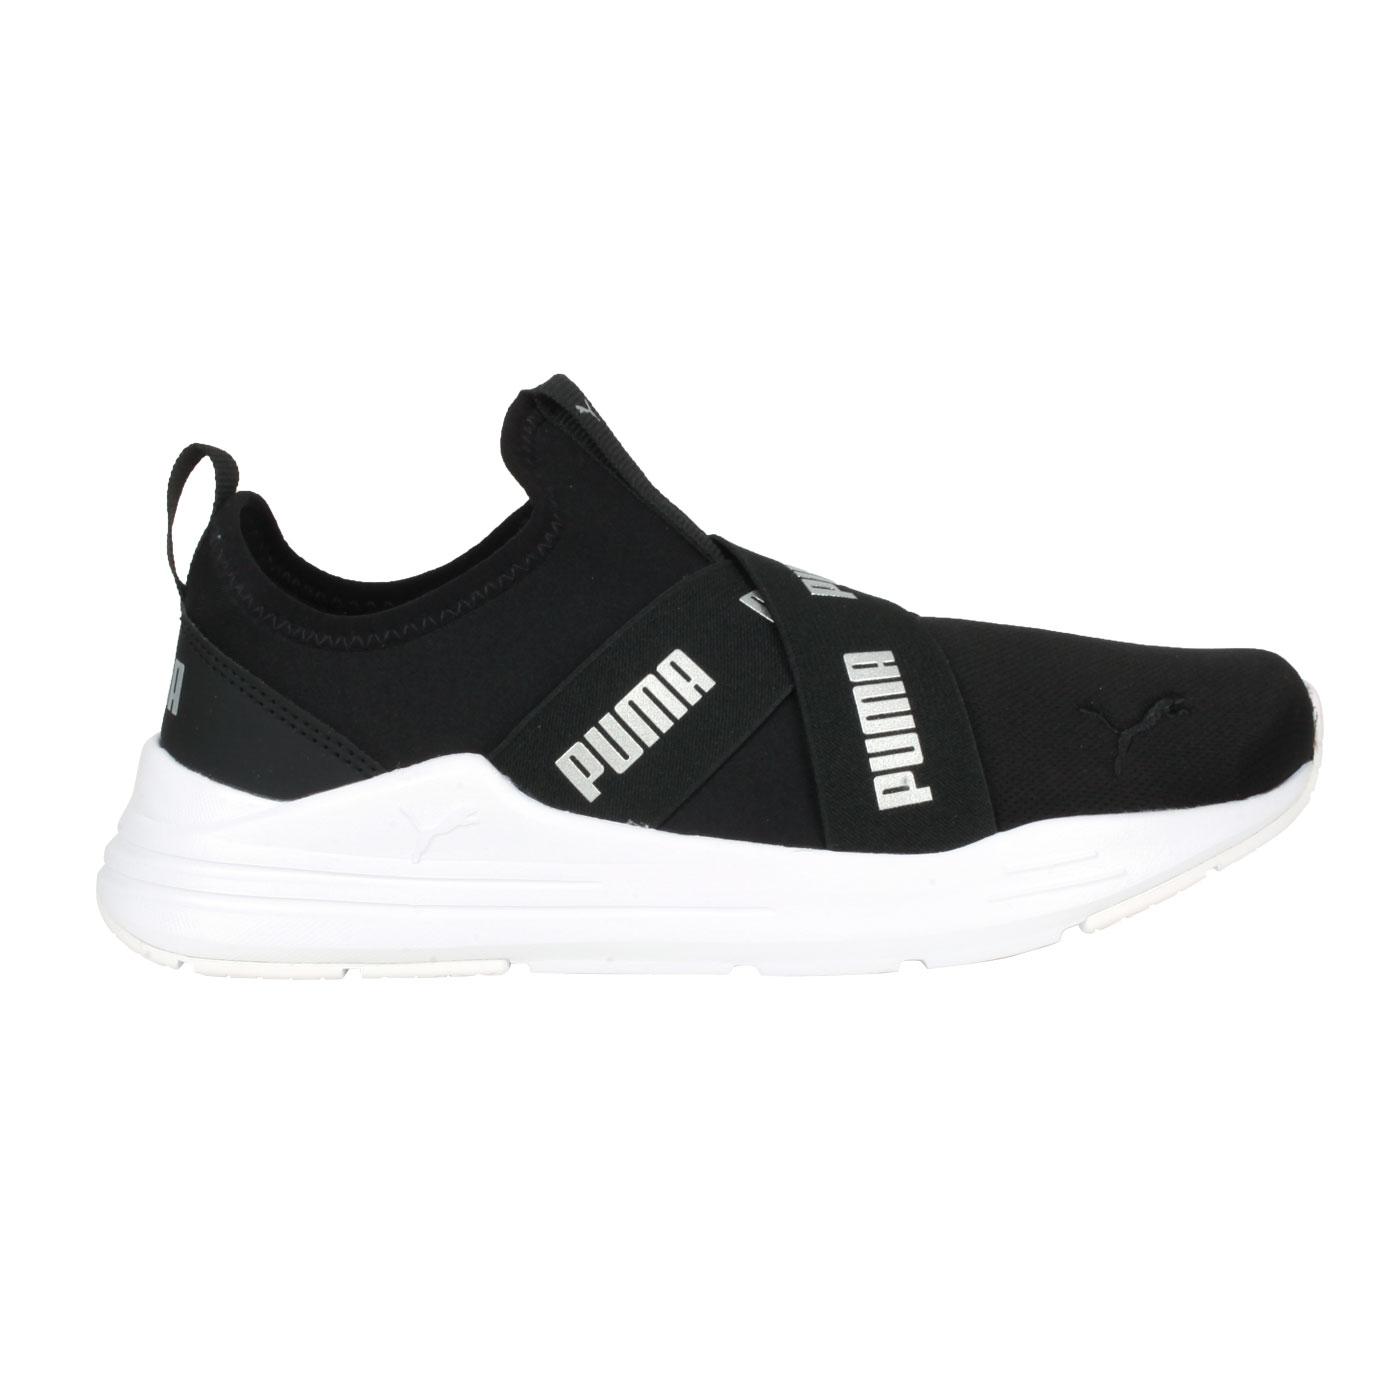 PUMA 女款休閒鞋  @Wired Run Slipon Wmns@38229901